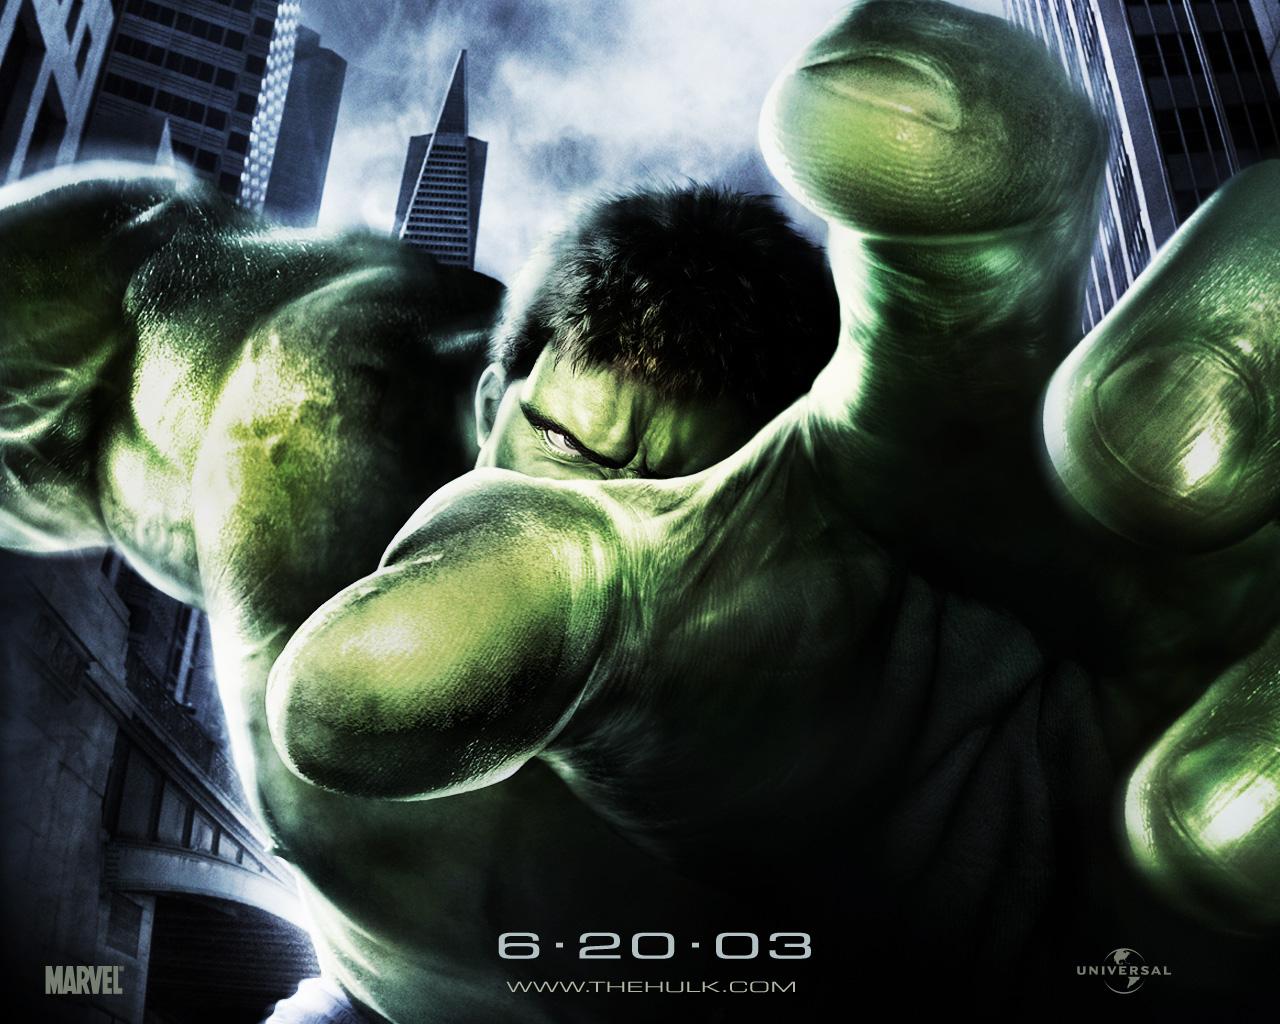 Wonderful Wallpaper Mobile Hulk - The_Hulk-005  Image_916640.jpg